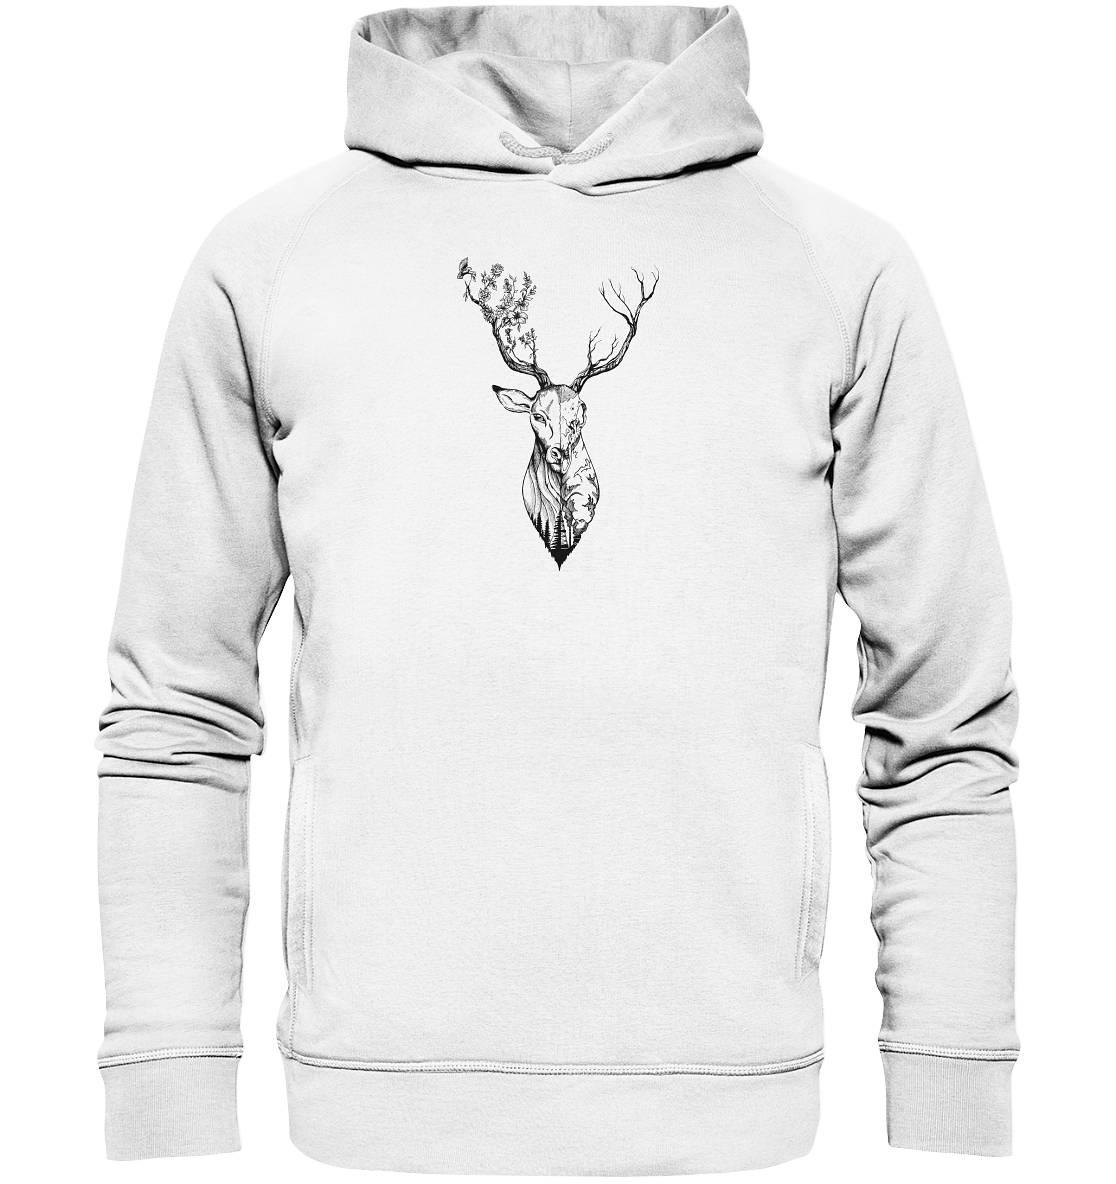 front-organic-fashion-hoodie-f8f8f8-1116x-8.png